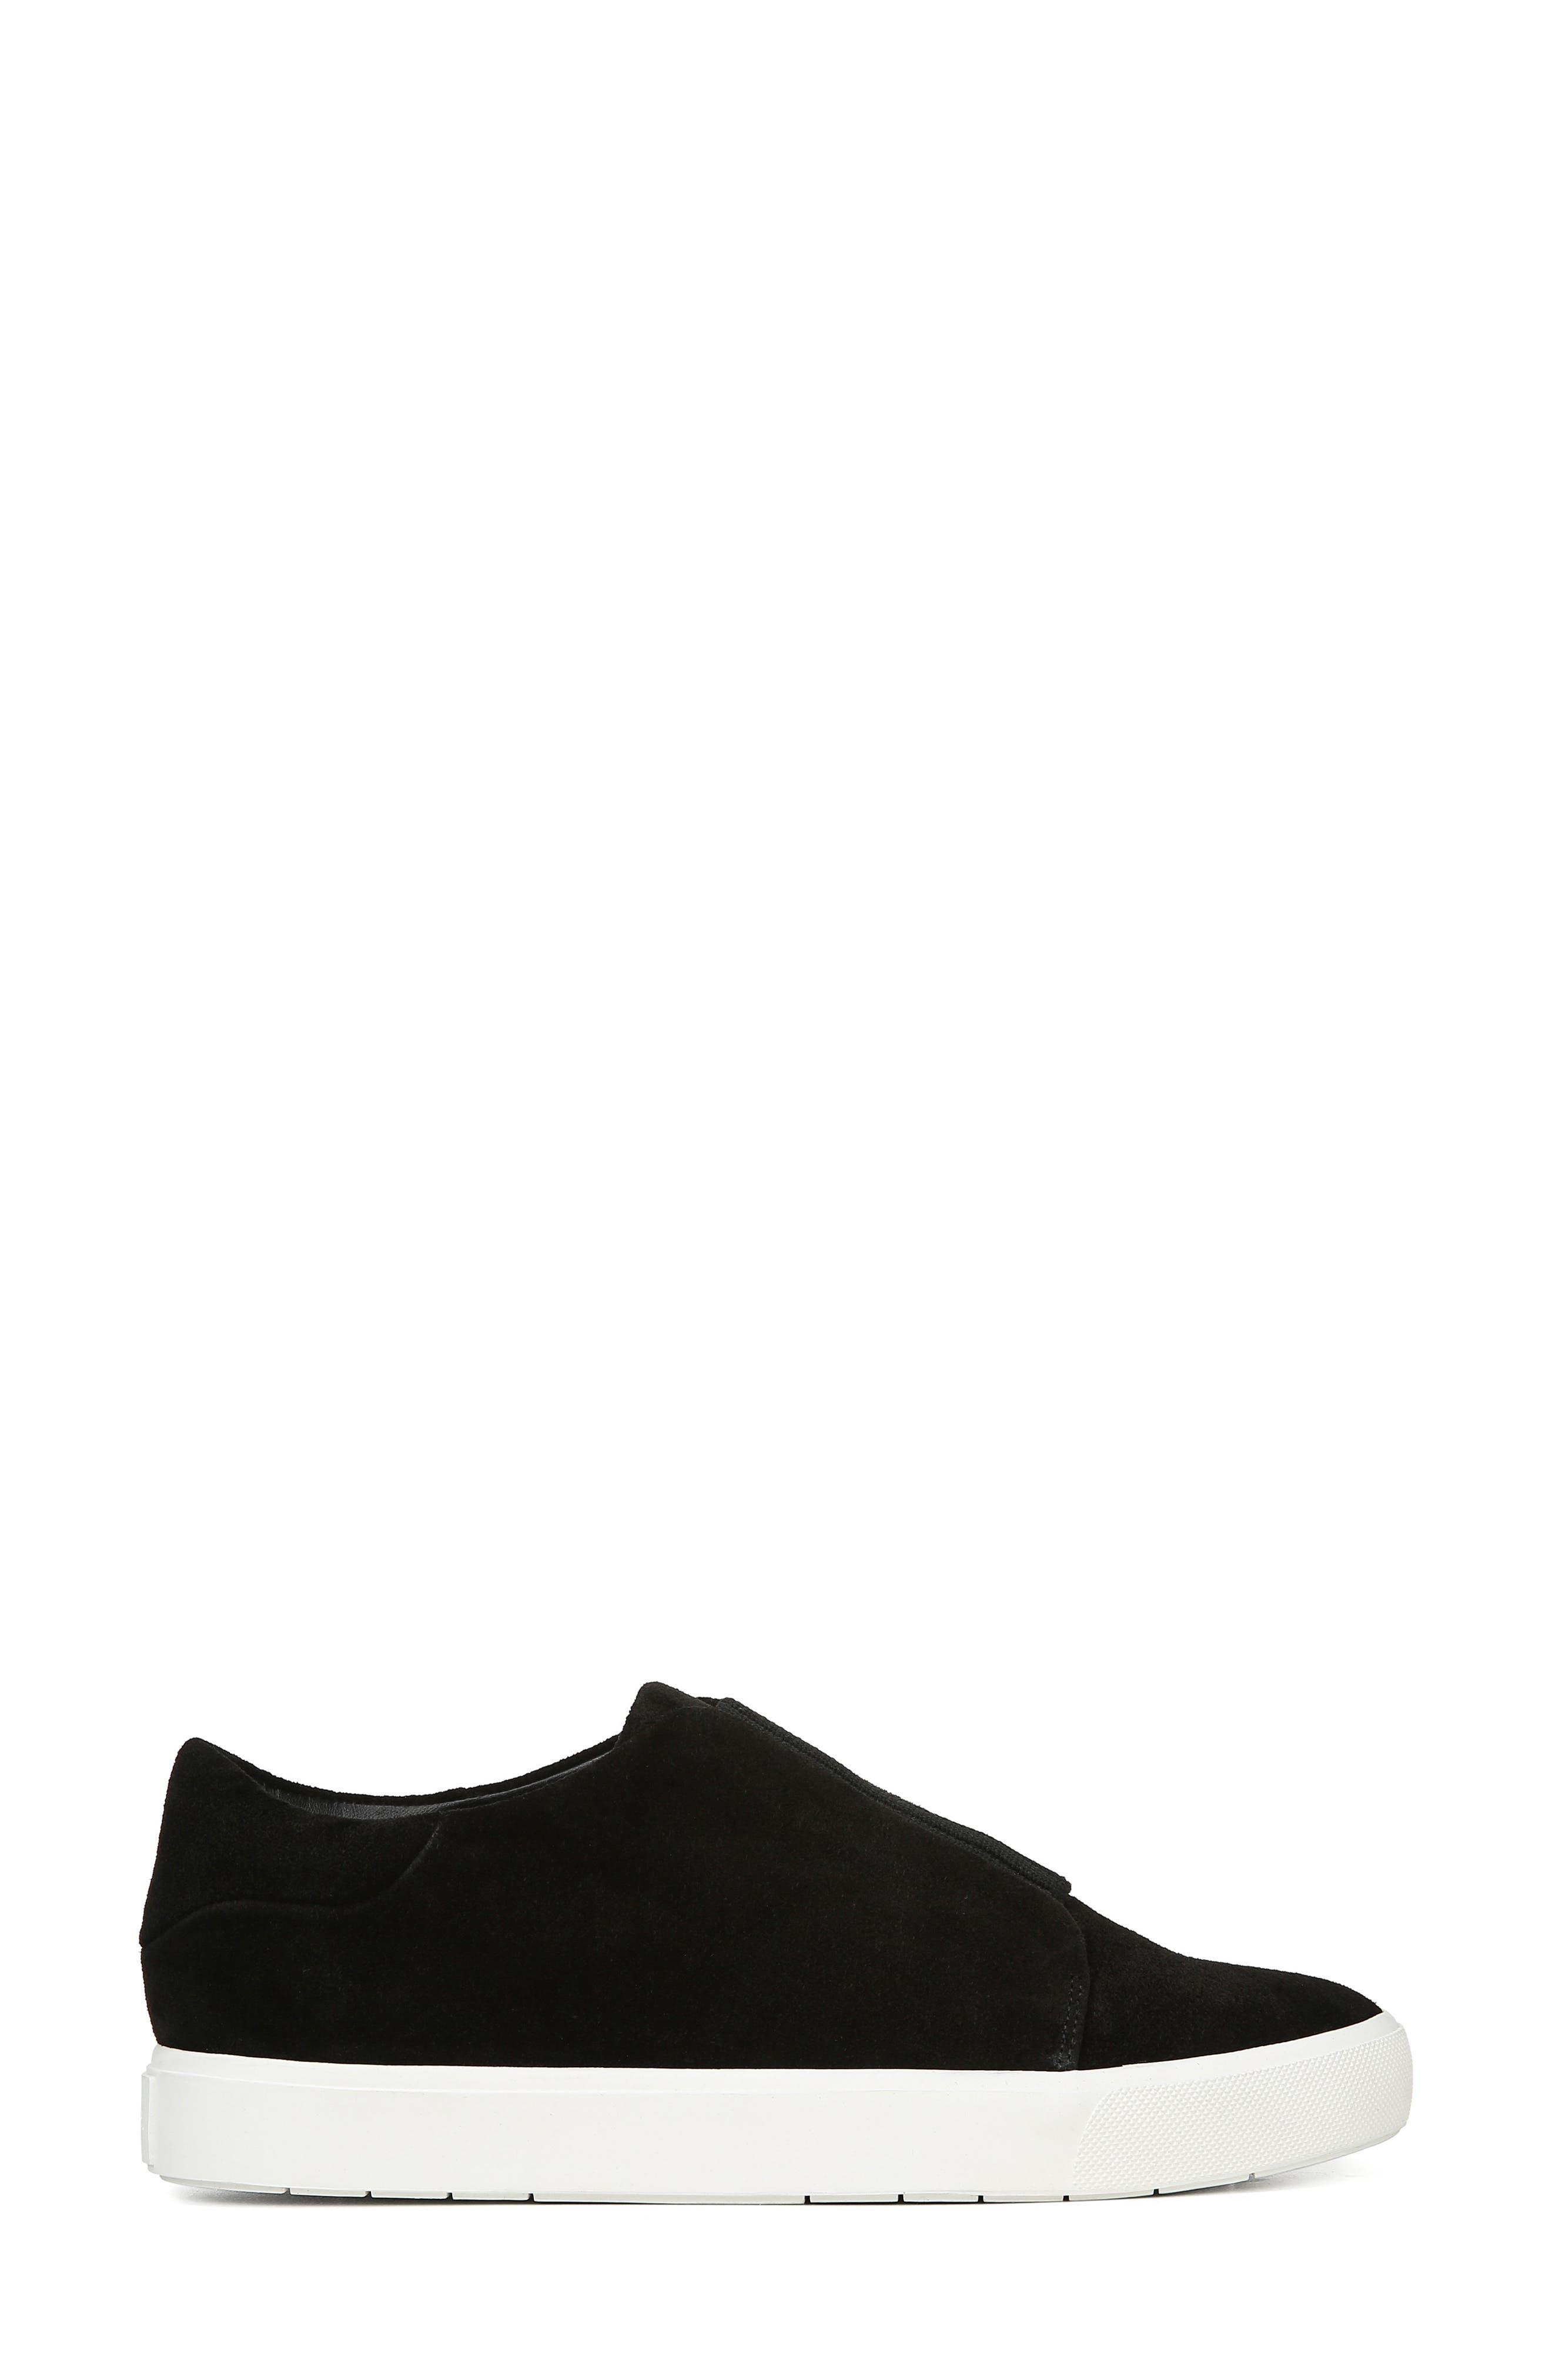 Cantara Slip-On Sneaker,                             Alternate thumbnail 3, color,                             BLACK SUEDE